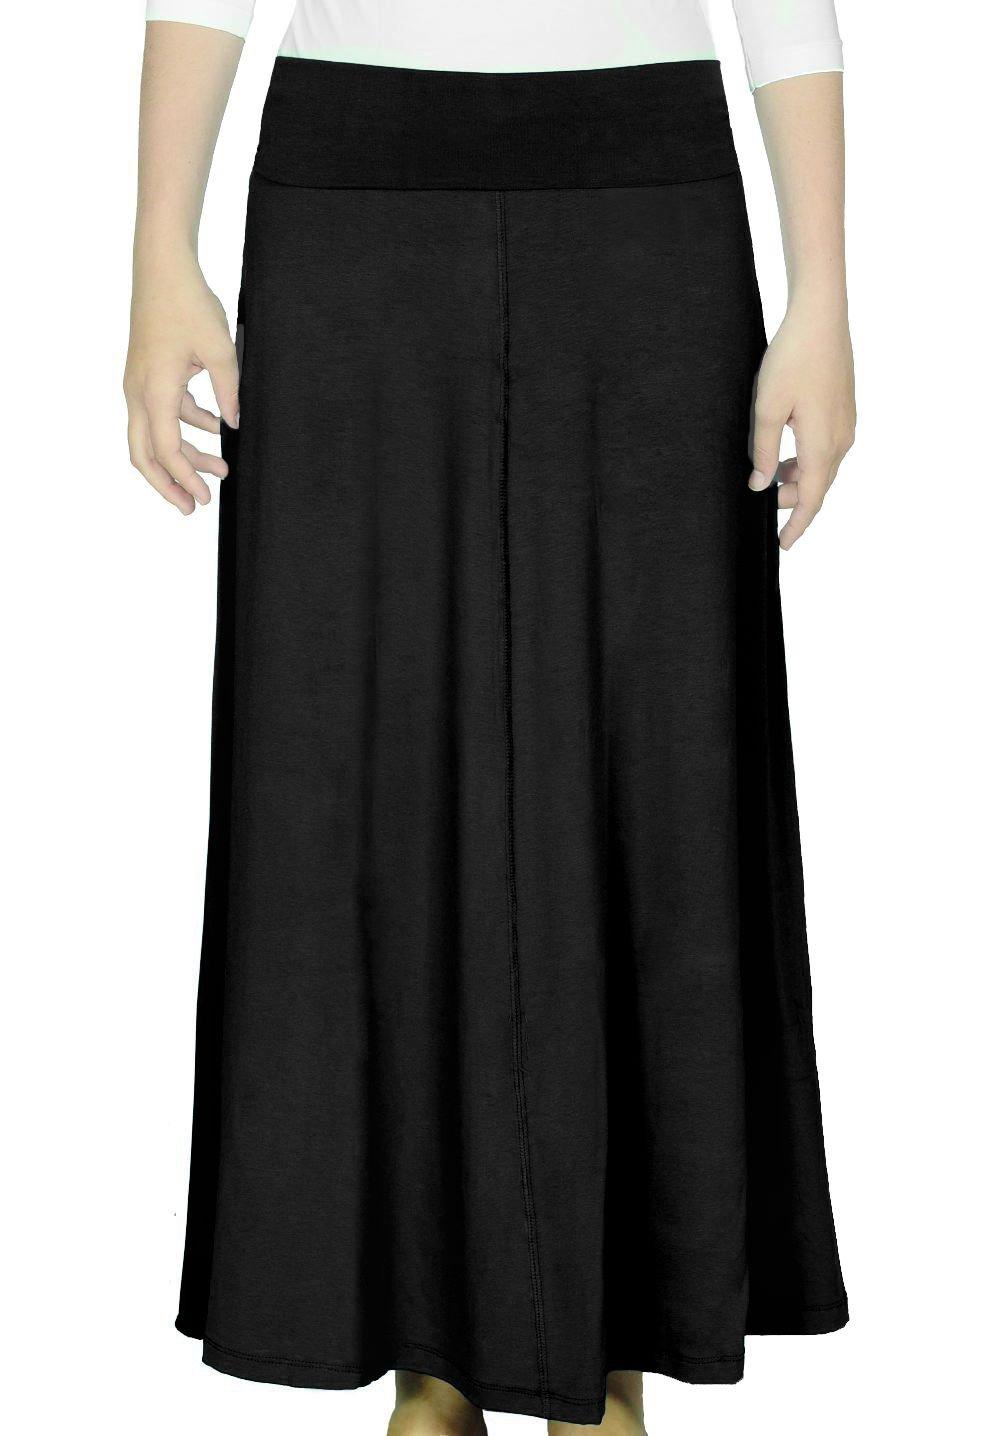 Kosher Casual Kids Big Girls' Modest Long Flowing Maxi Skirt Medium Black